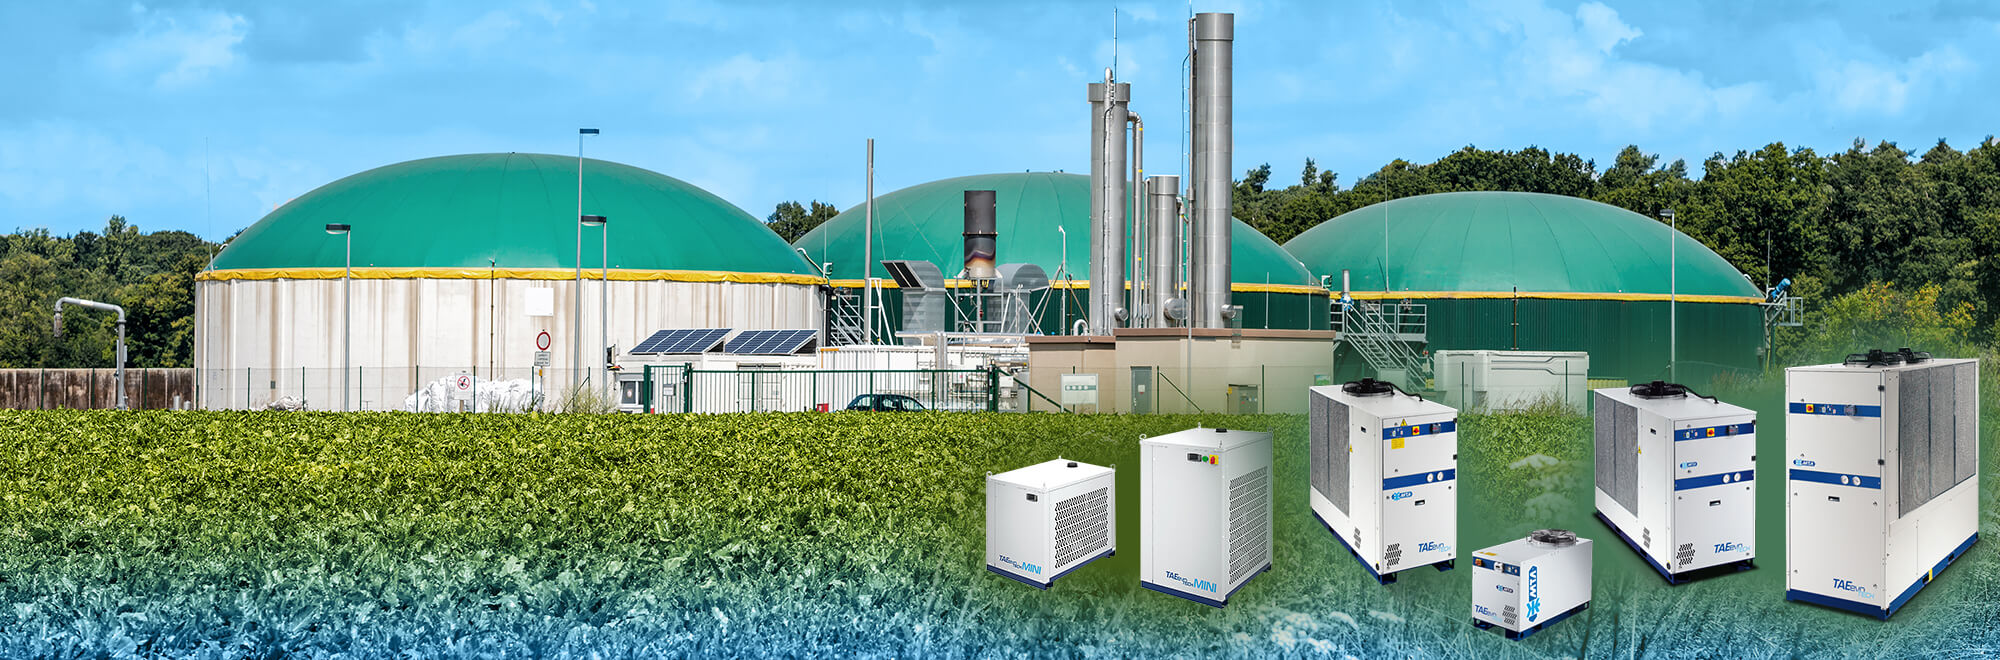 Gaskühlung & Gastrocknung